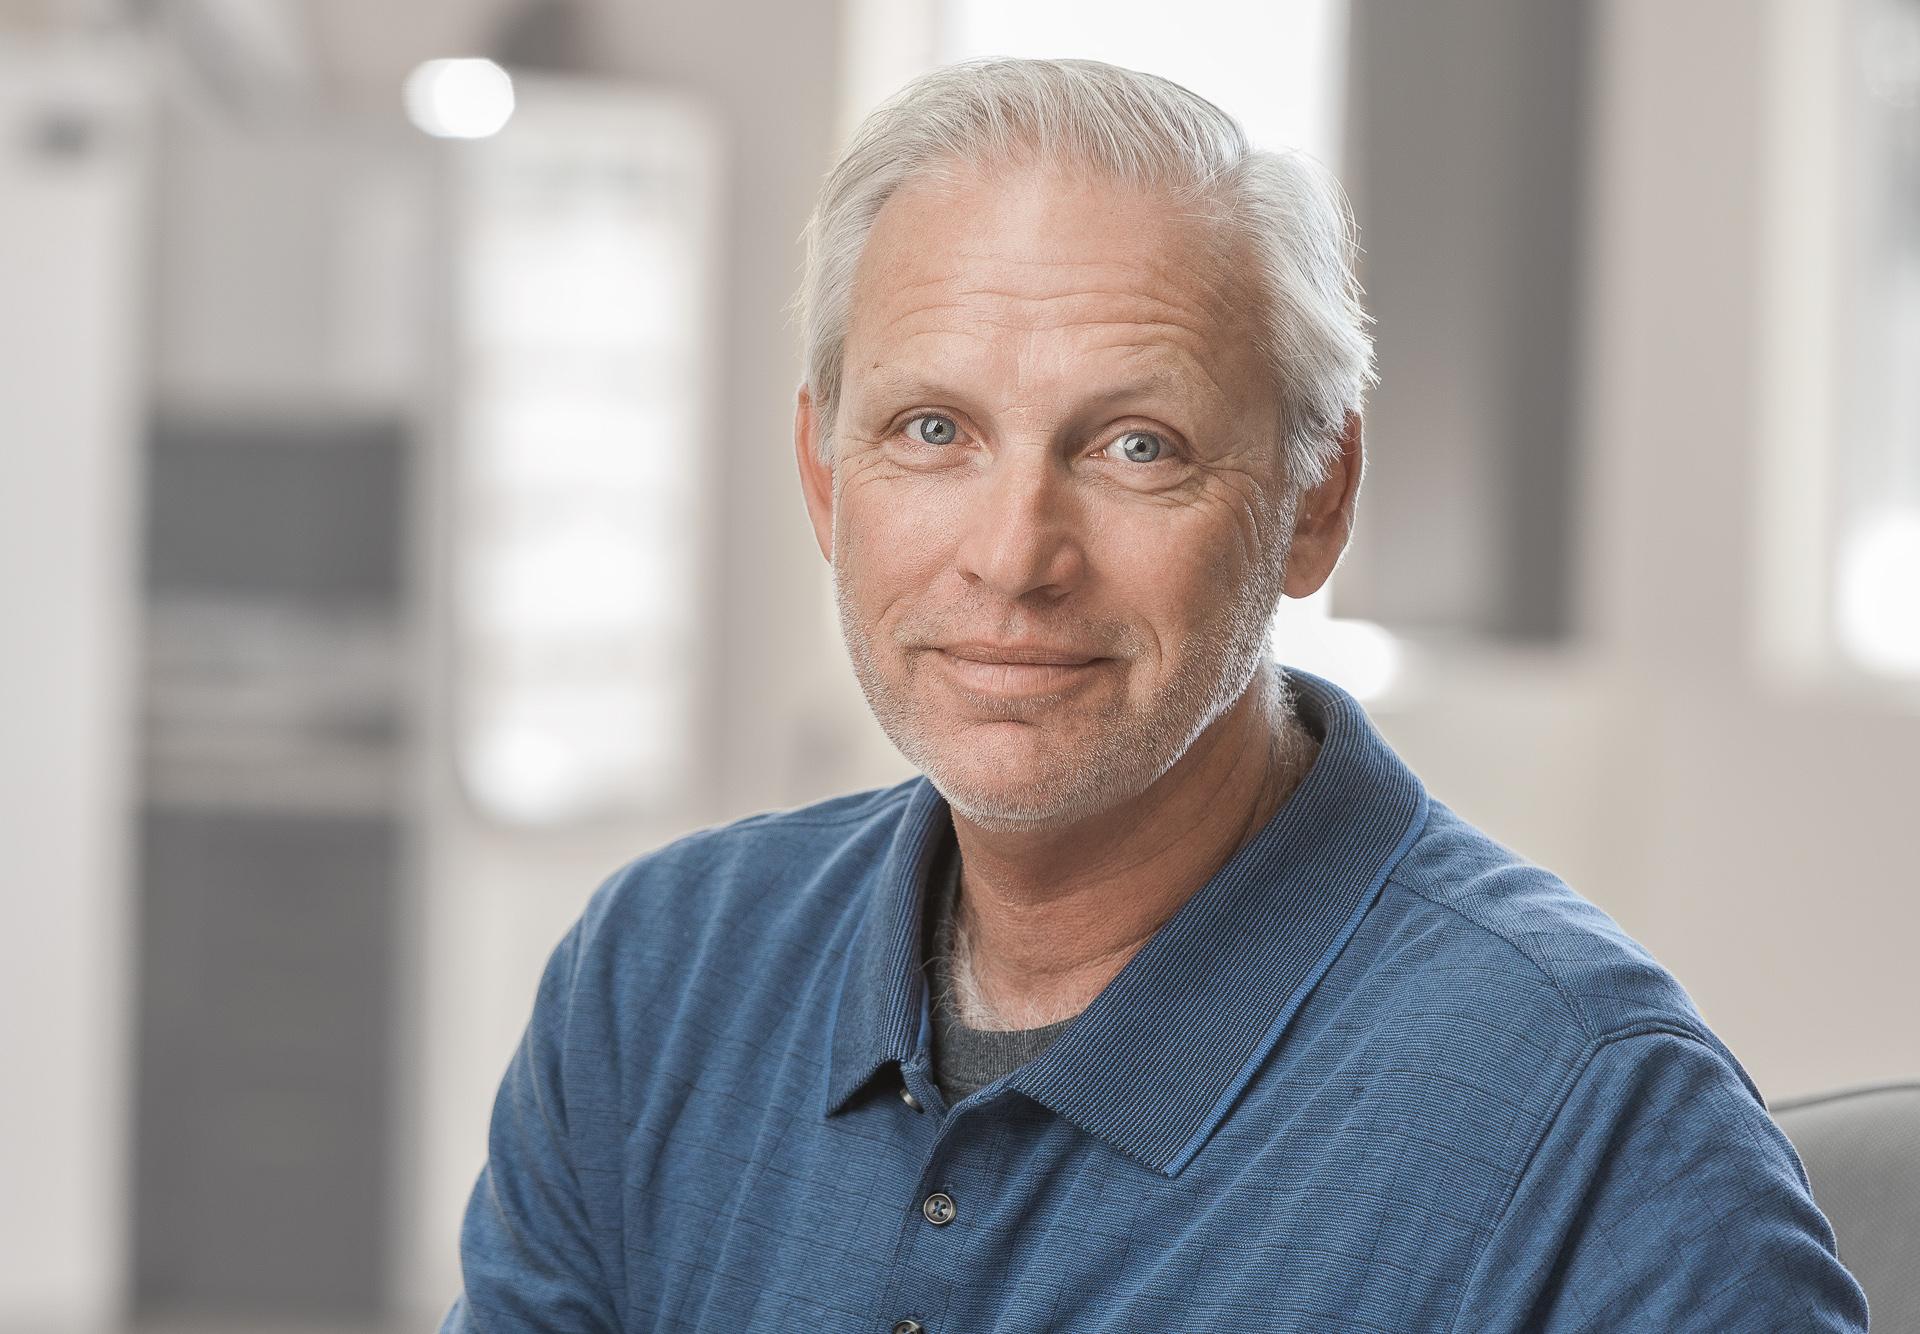 Corporate Portrait Photography | Omaha Portrait, editorial